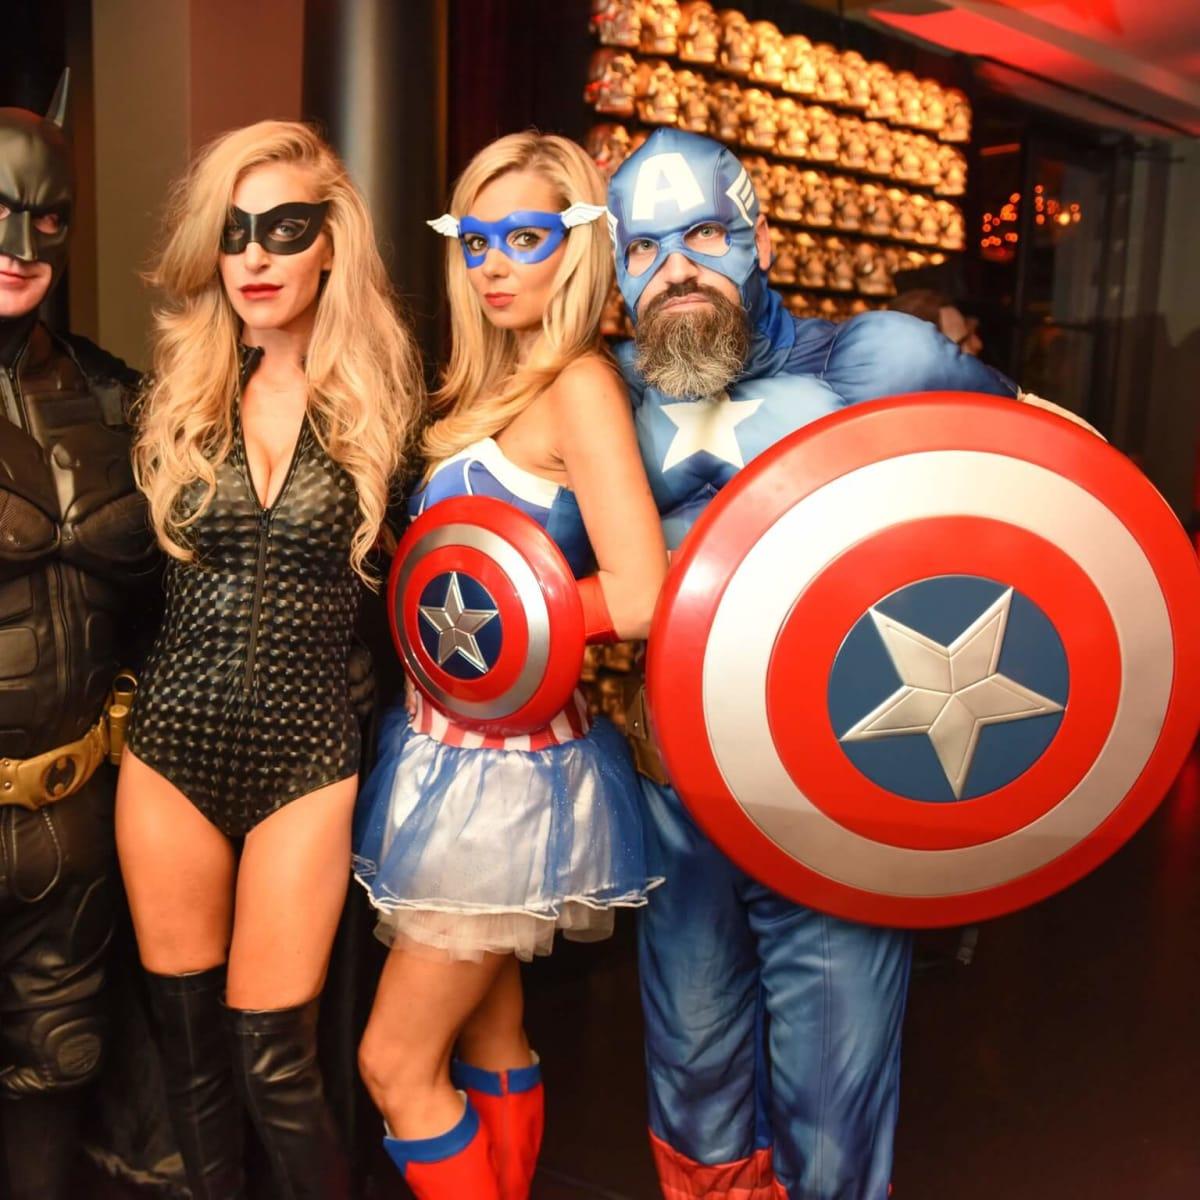 News, Shelby, Hotel ZaZa Halloween, Oct. 2015 Rick and Jennifer Kline, Amanda Hammond, Carlos Zubizarreta